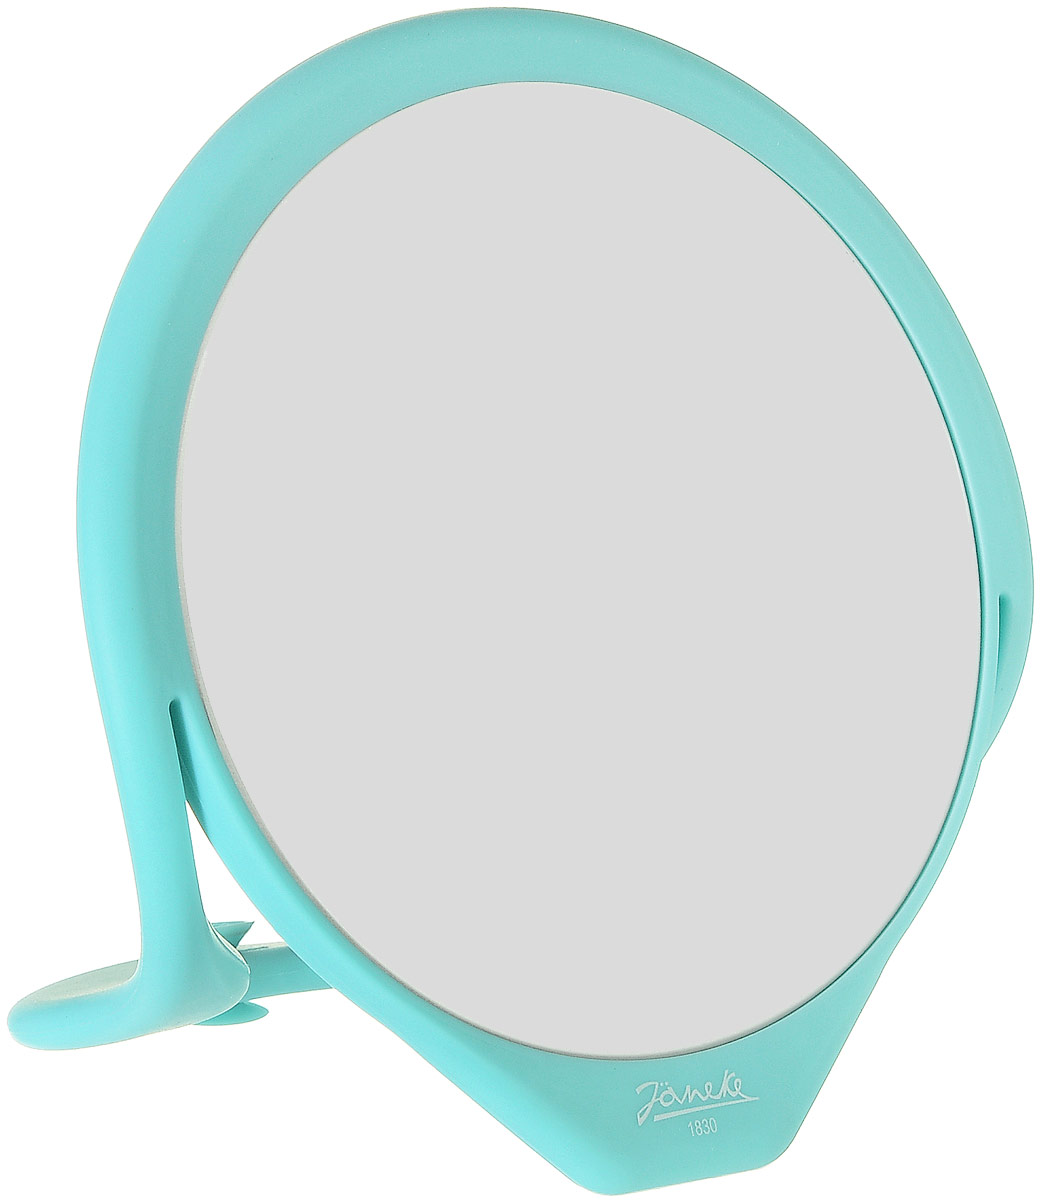 Janeke Зеркало настольное, 10445 TSE